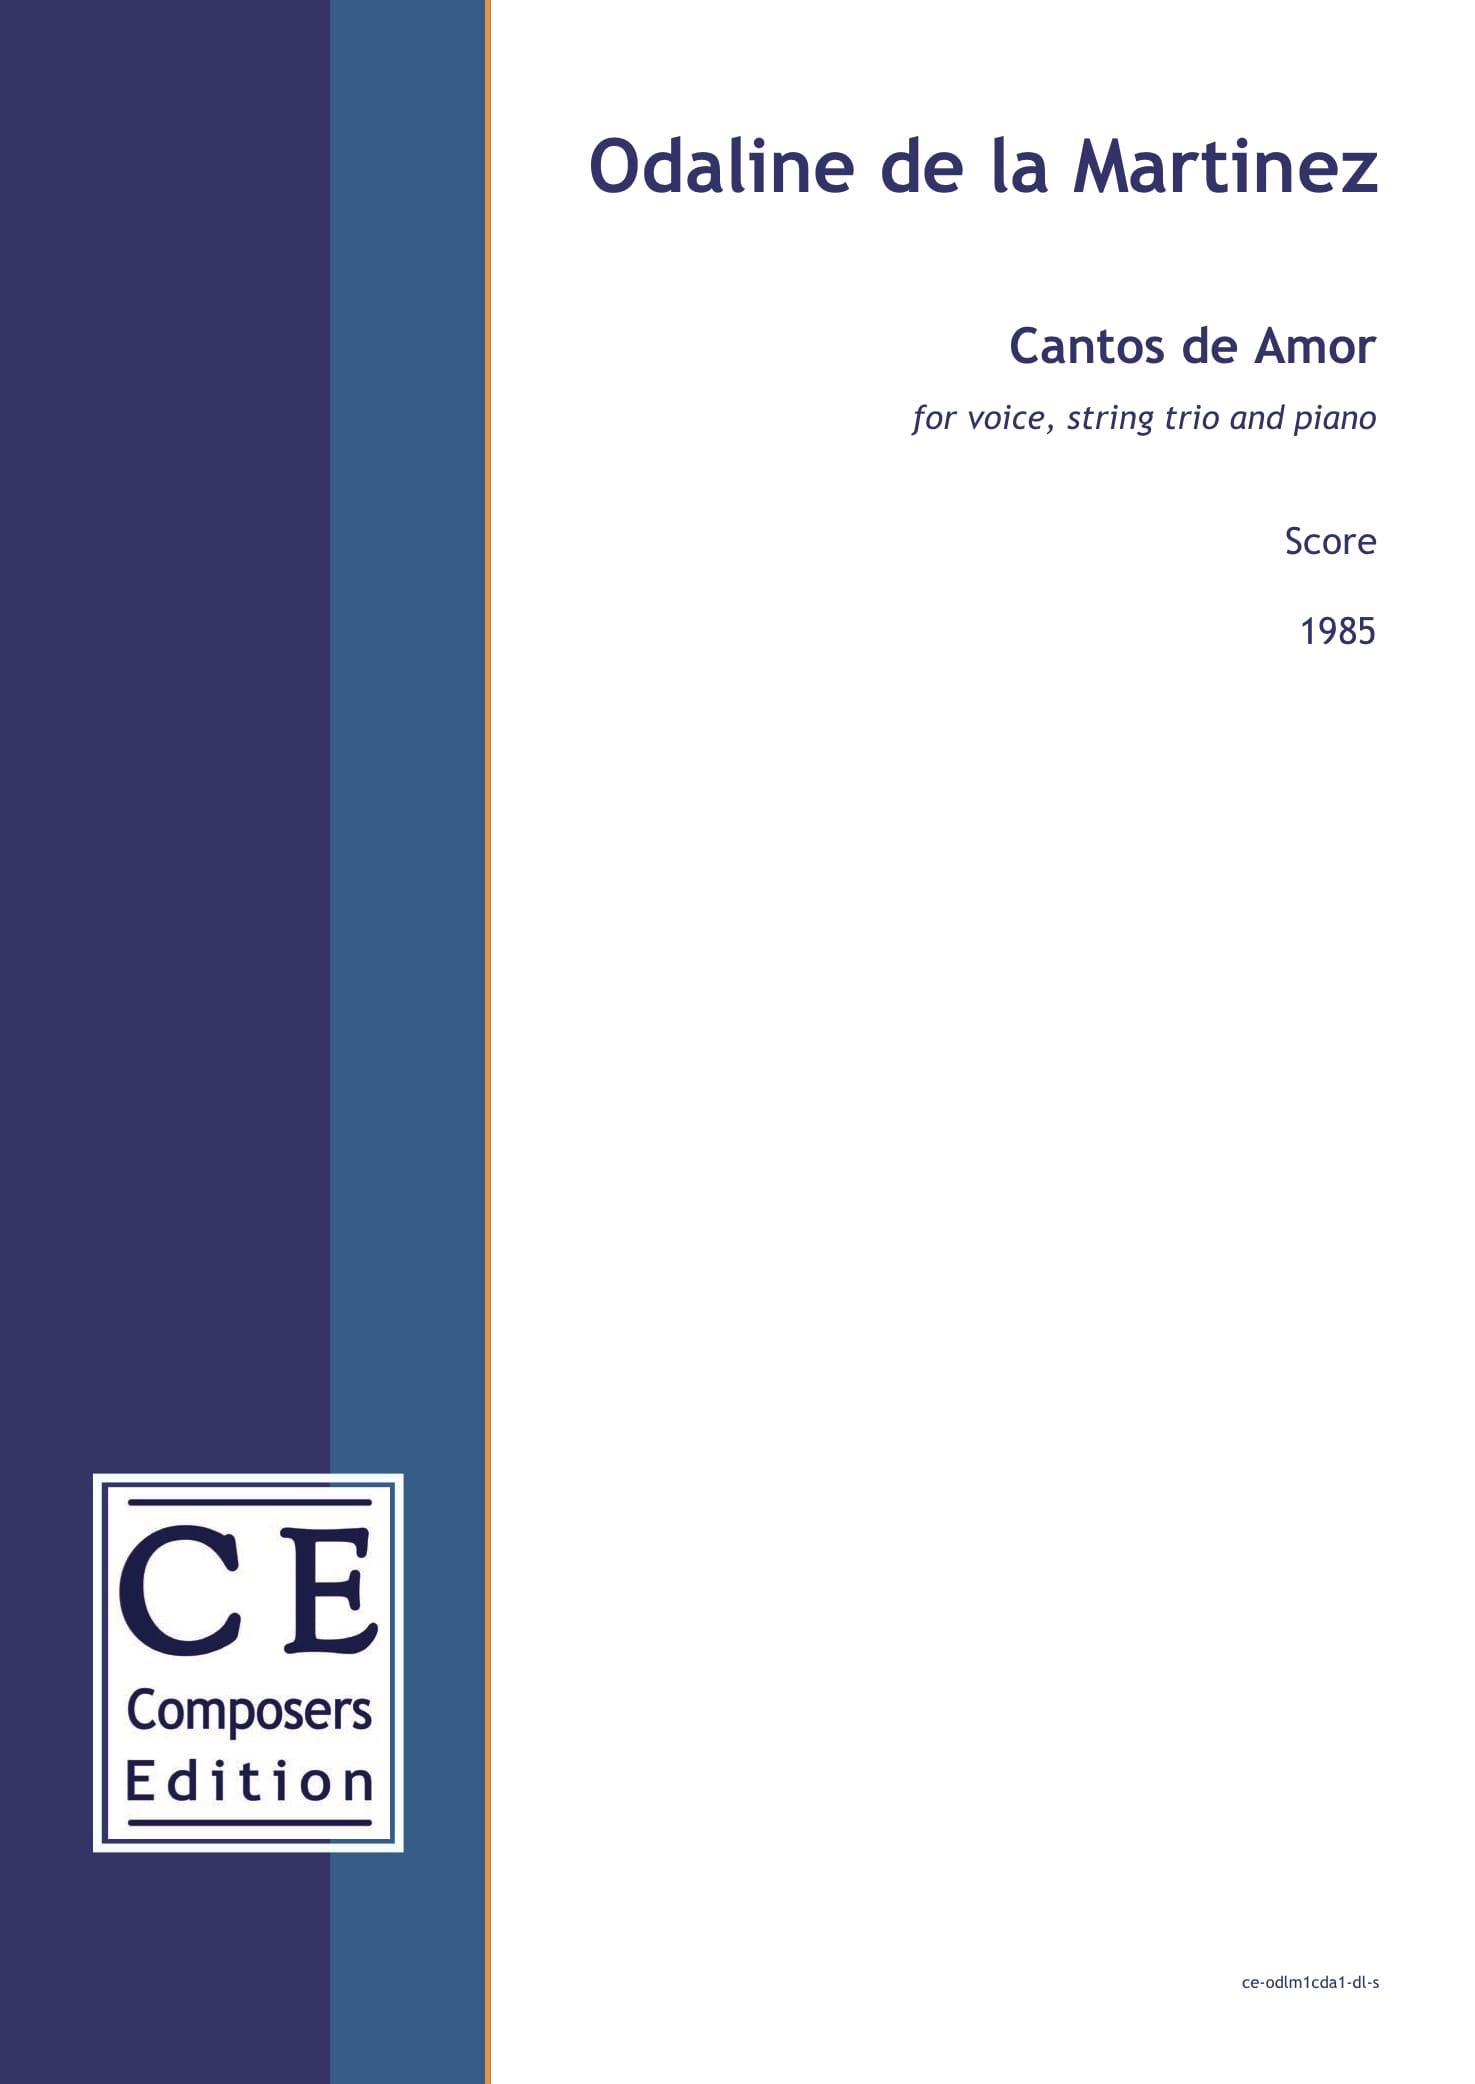 Odaline de la Martinez: Cantos de Amor for voice, string trio and piano